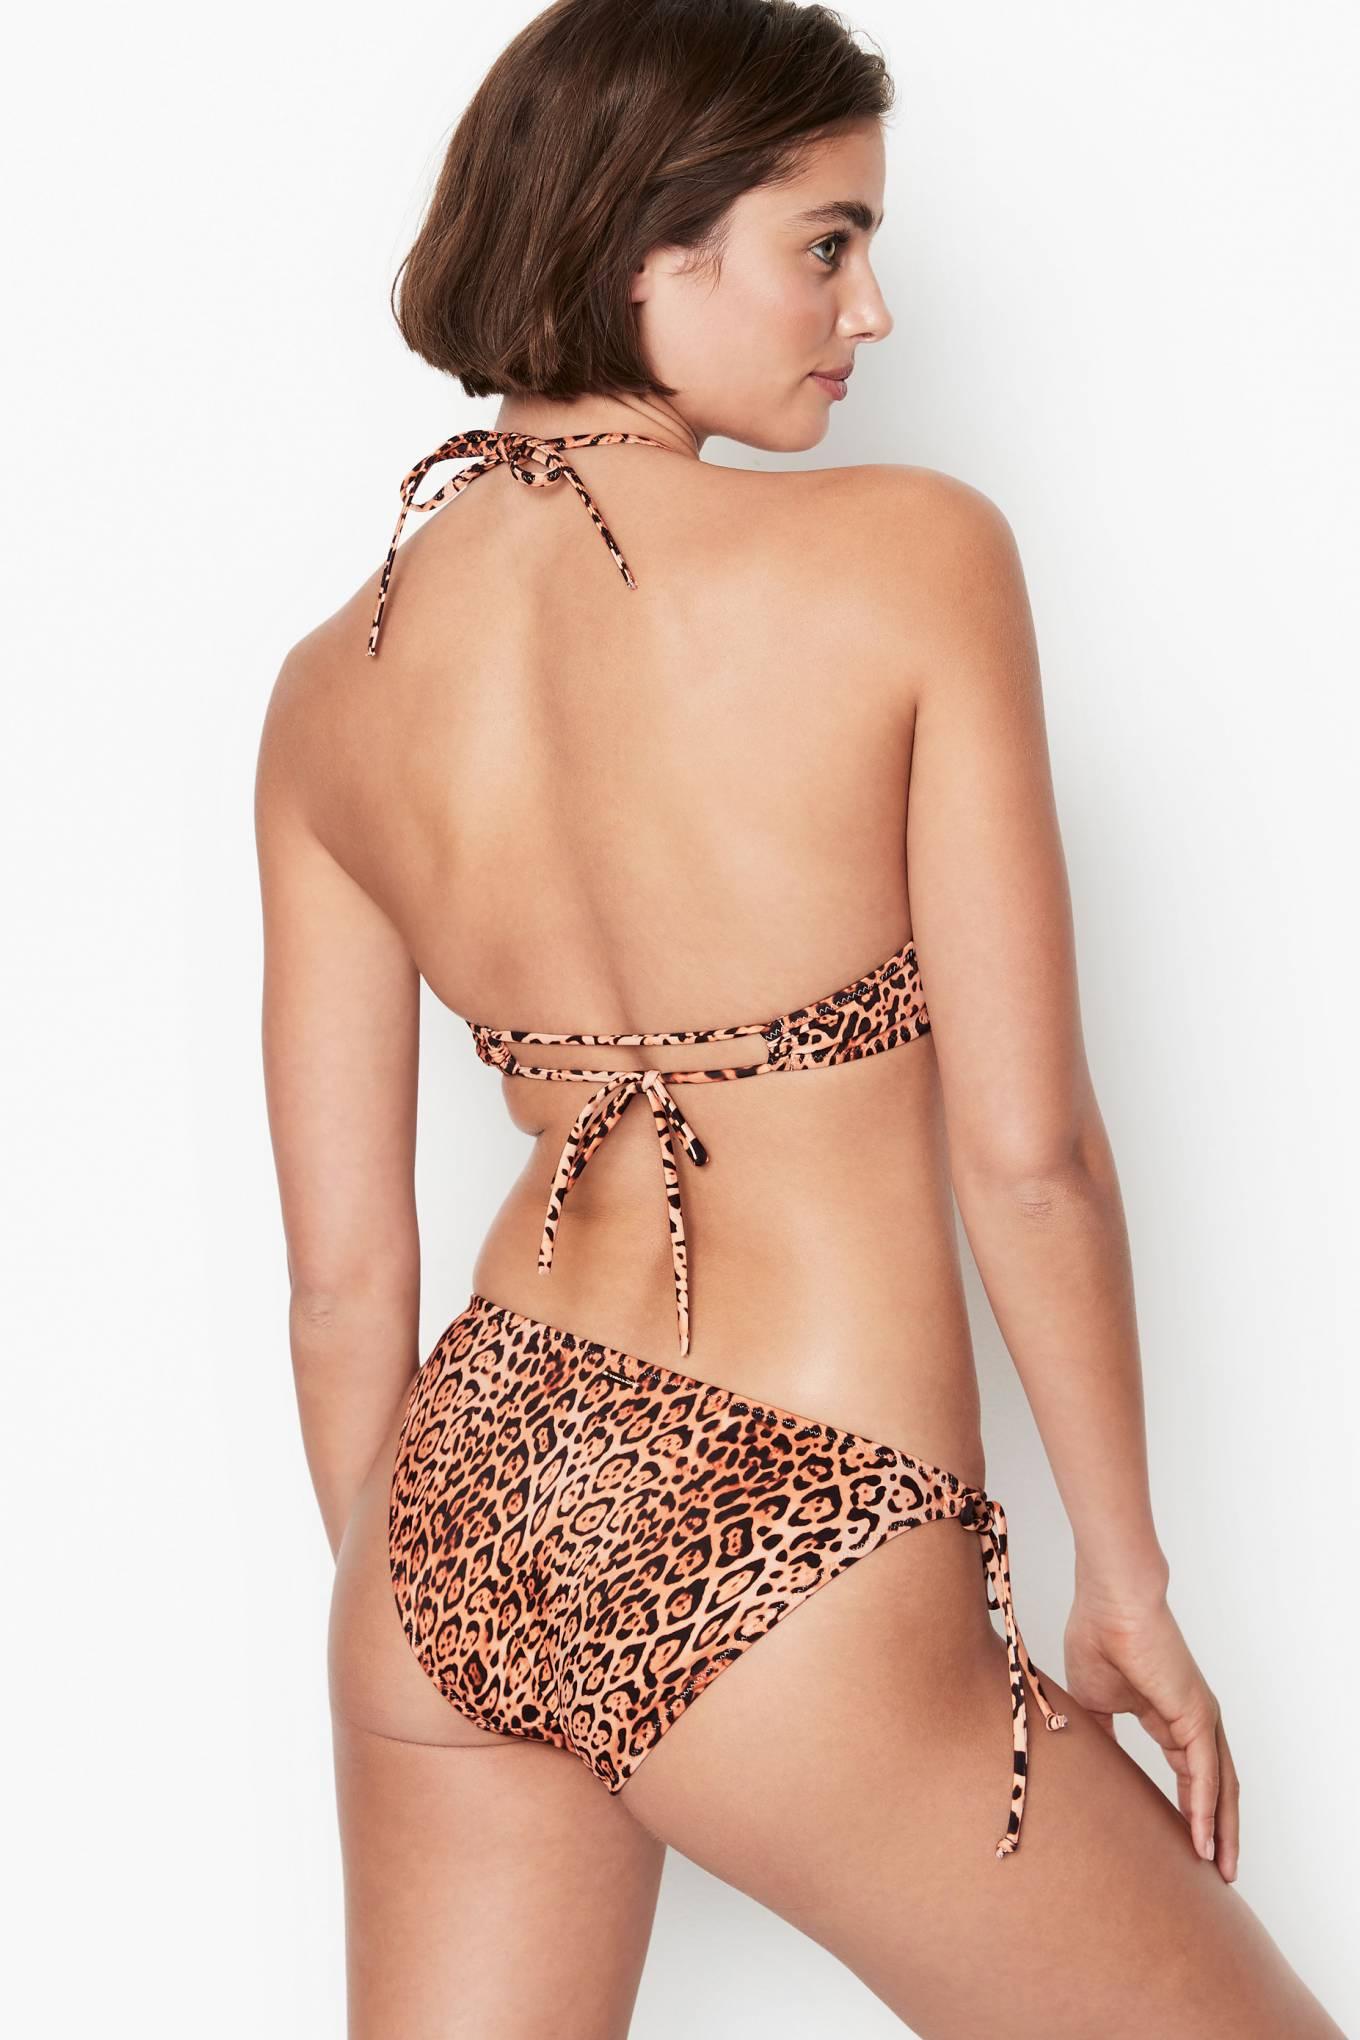 Taylor Hill rocking sexy brown nylon leopard print bikini bottom with tied waist